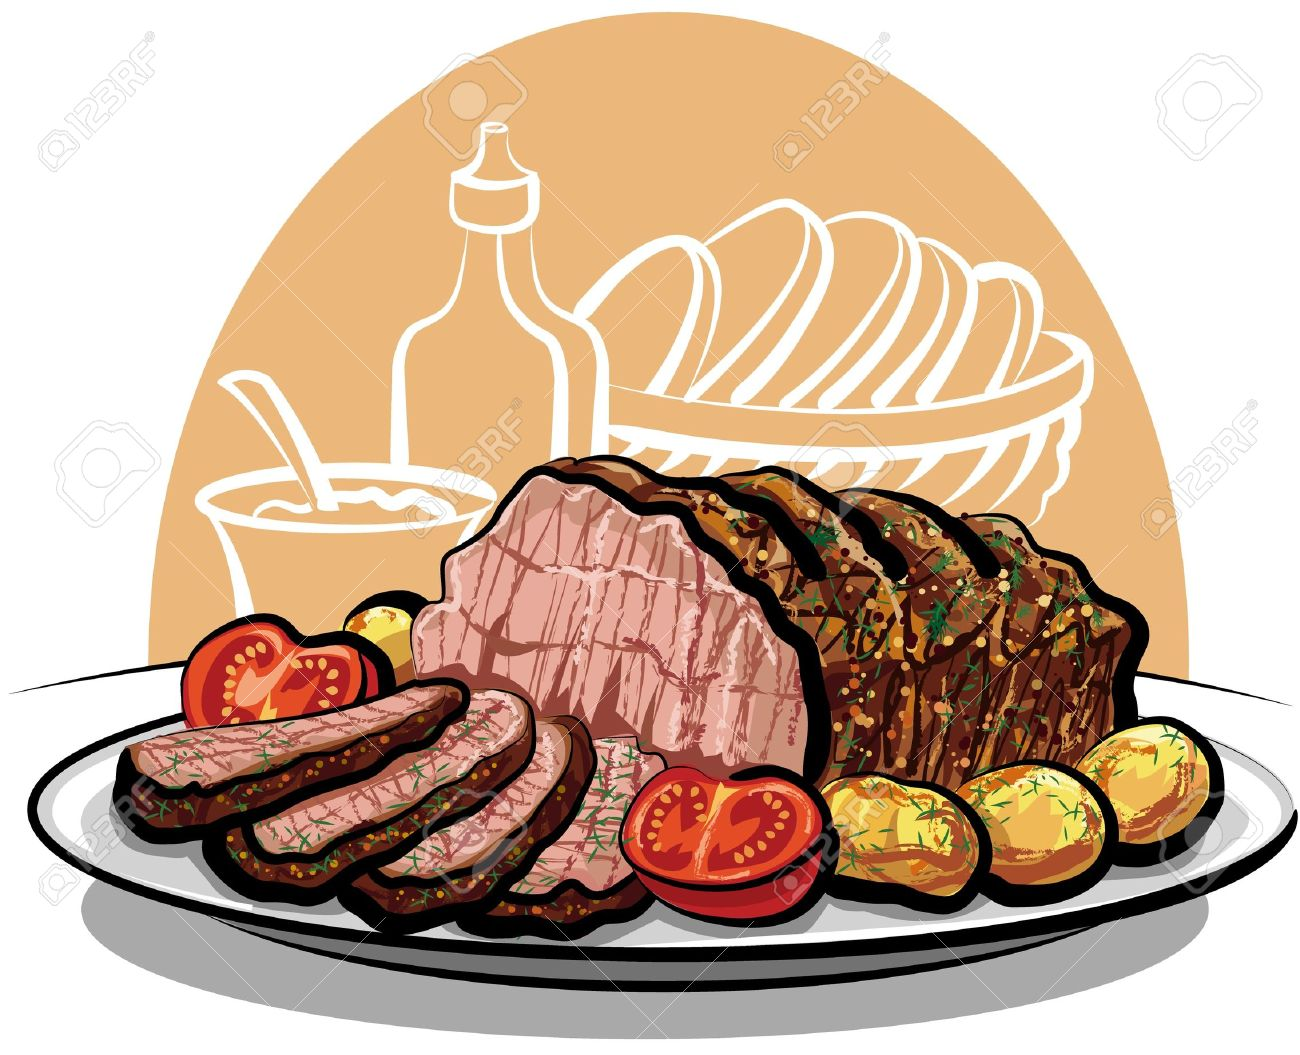 Free Cartoon Steak Cliparts, Download Free Clip Art, Free.